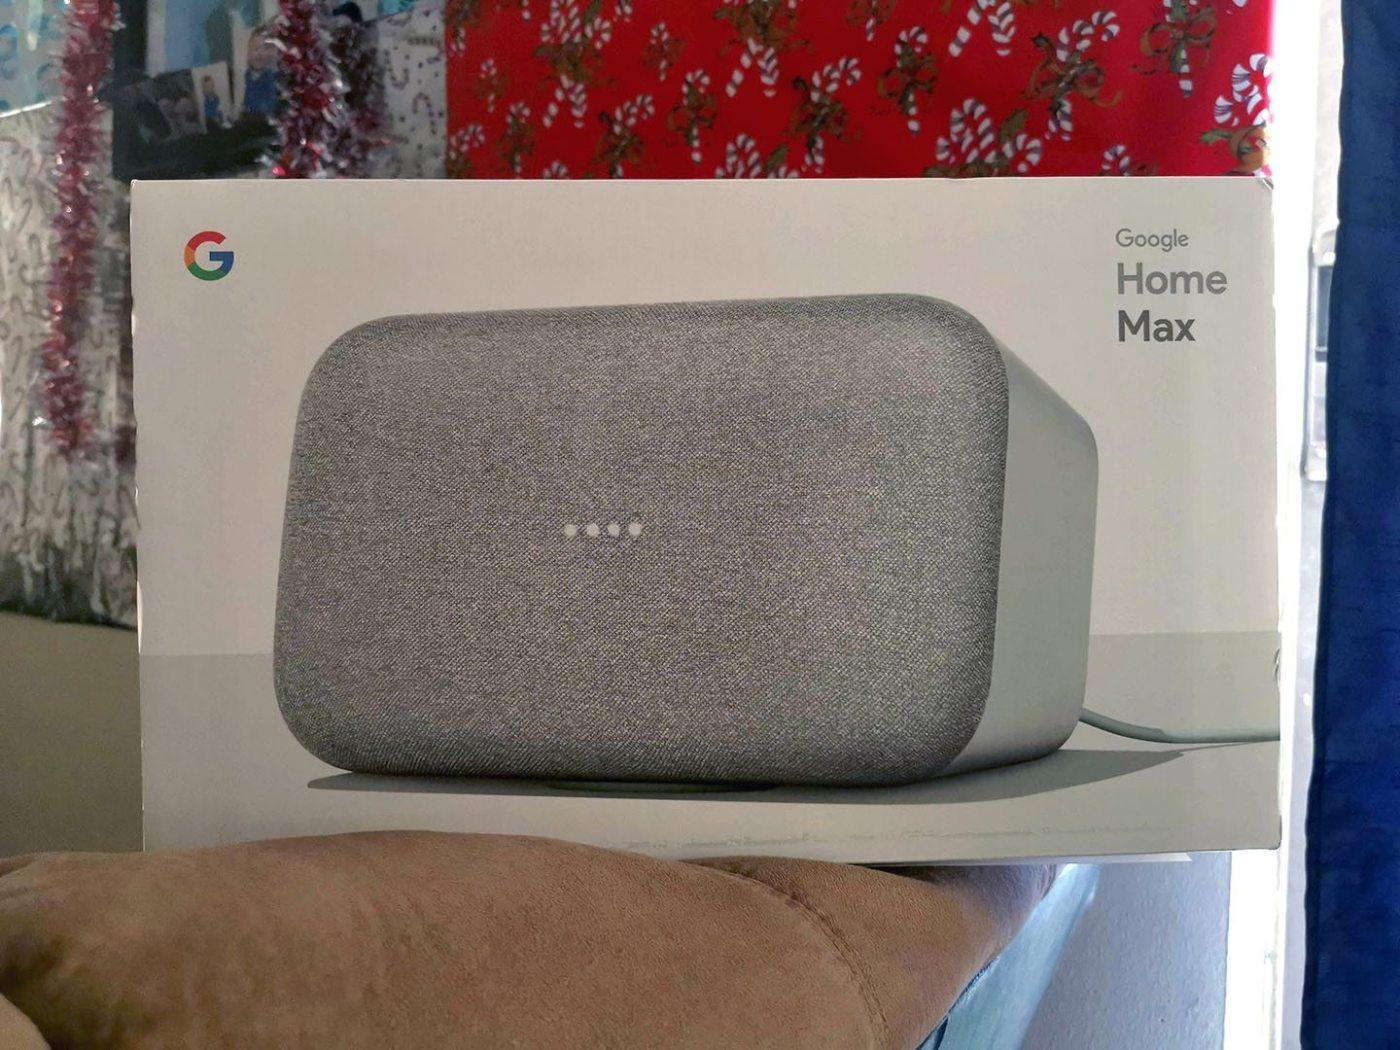 Christmas 2018 Google Home Max Android News Martin Ottawa All bytes